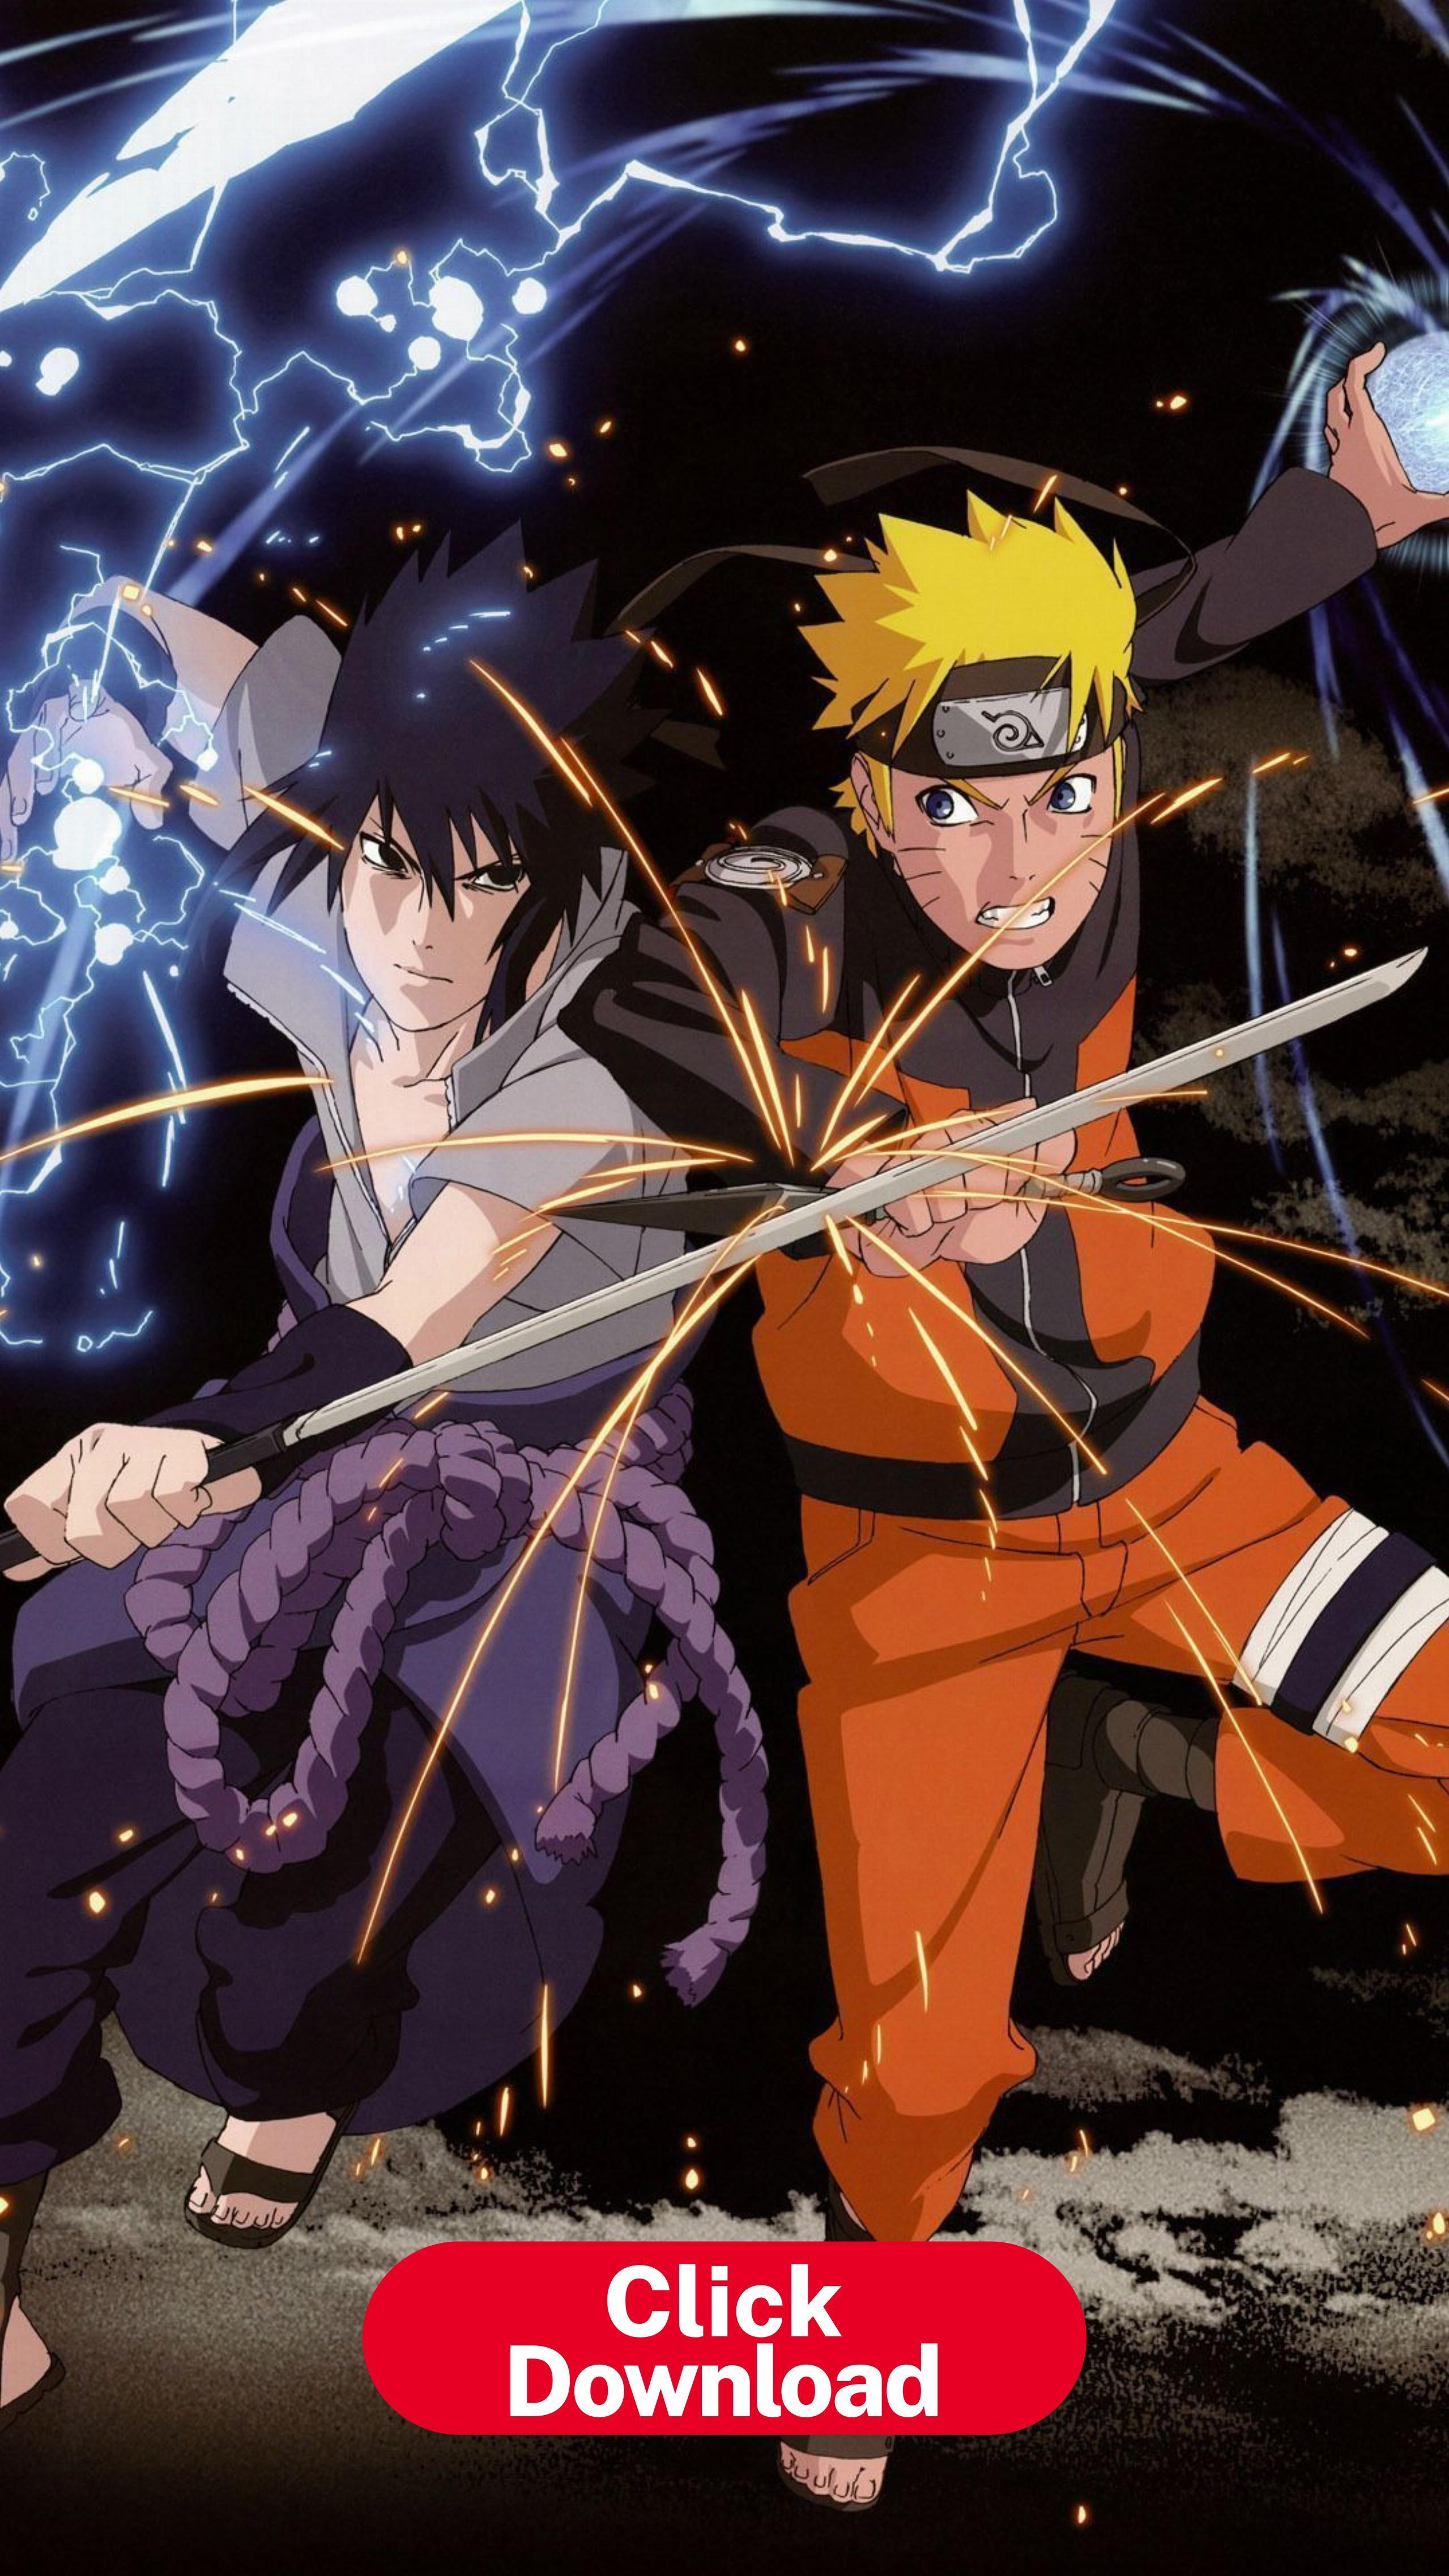 Las Canciones Mas Escuchadas En El Mundo Sazum Wallpapers Naruto Personajes De Naruto Shippuden Personajes De Anime Iphone naruto vs sasuke final battle